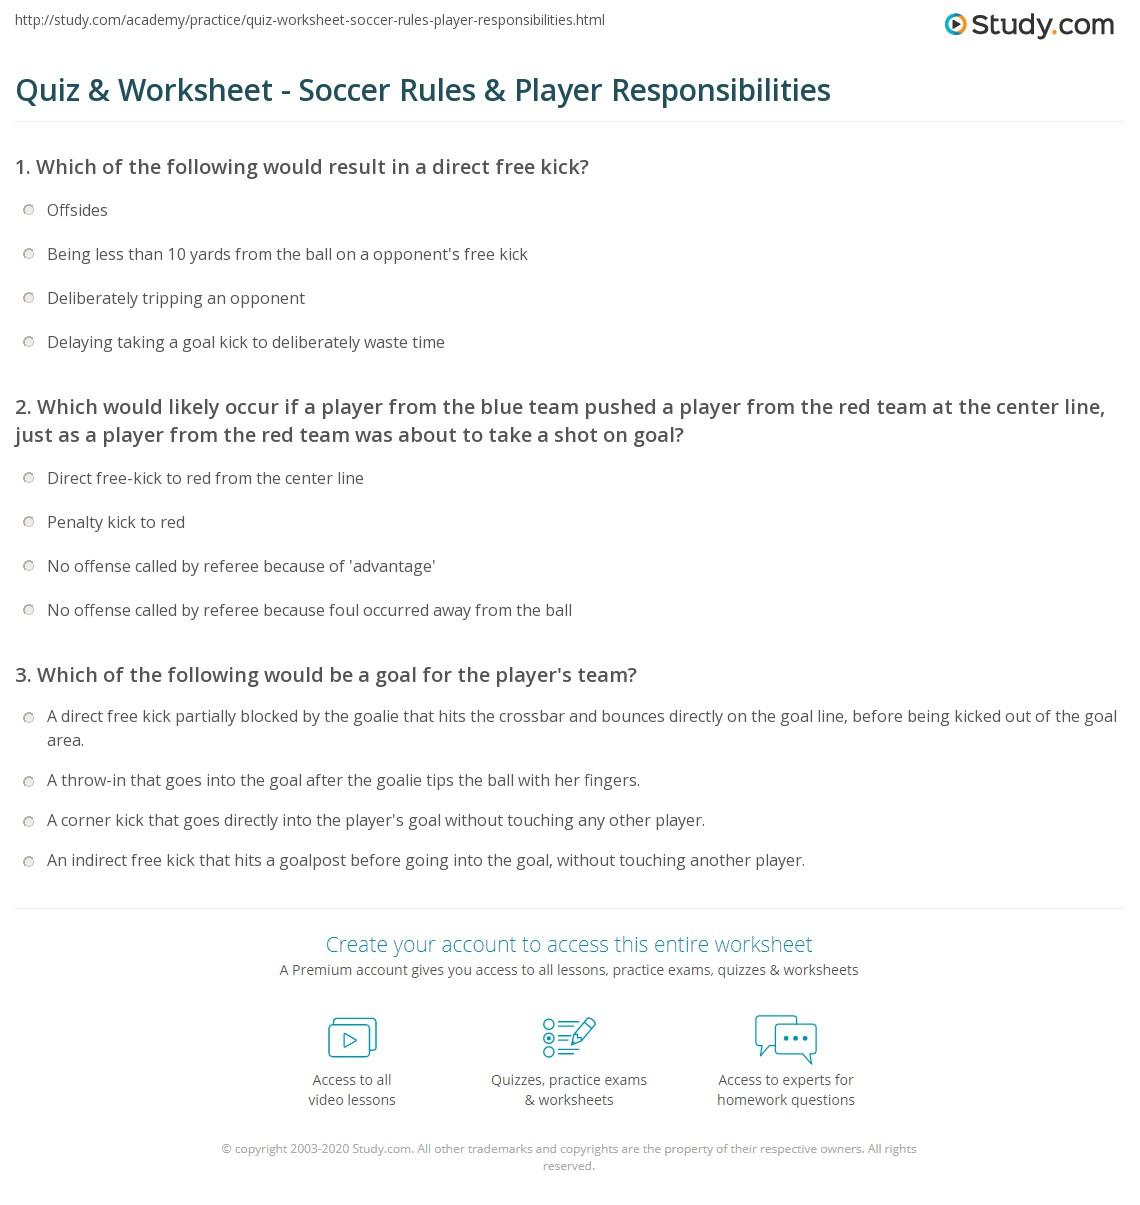 quiz worksheet soccer rules player responsibilities. Black Bedroom Furniture Sets. Home Design Ideas